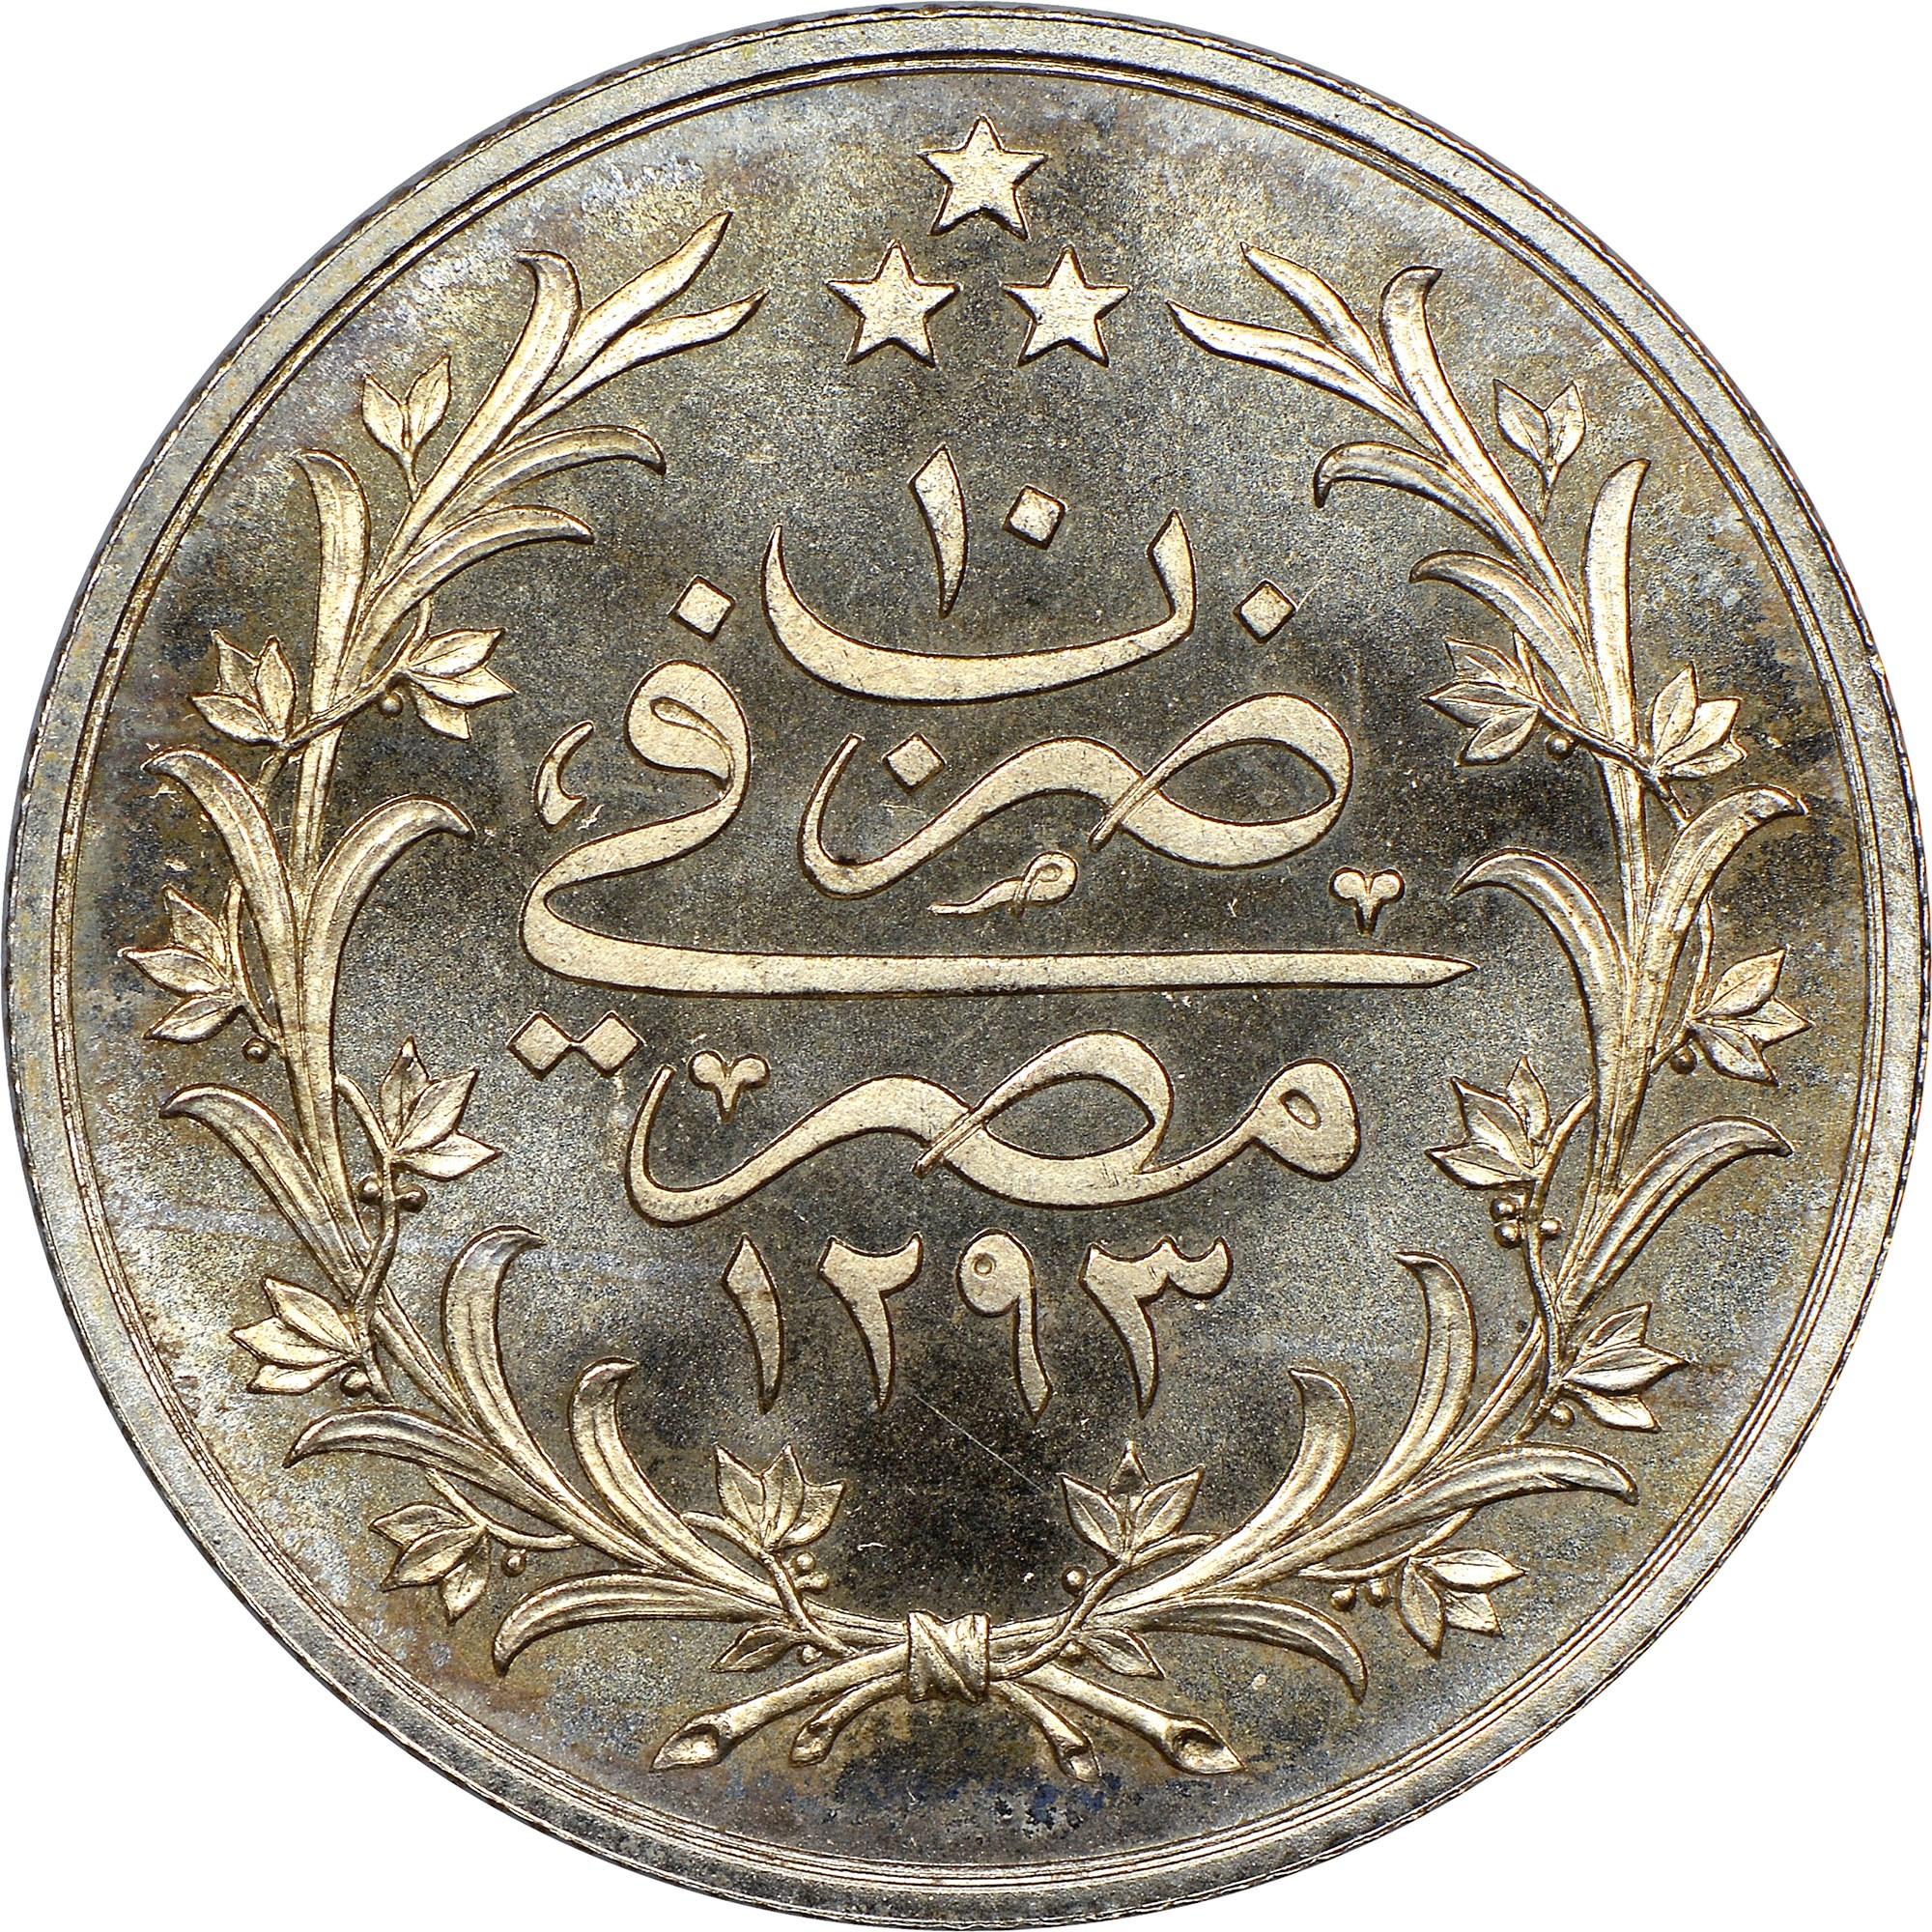 Egypt 5 Qirsh reverse